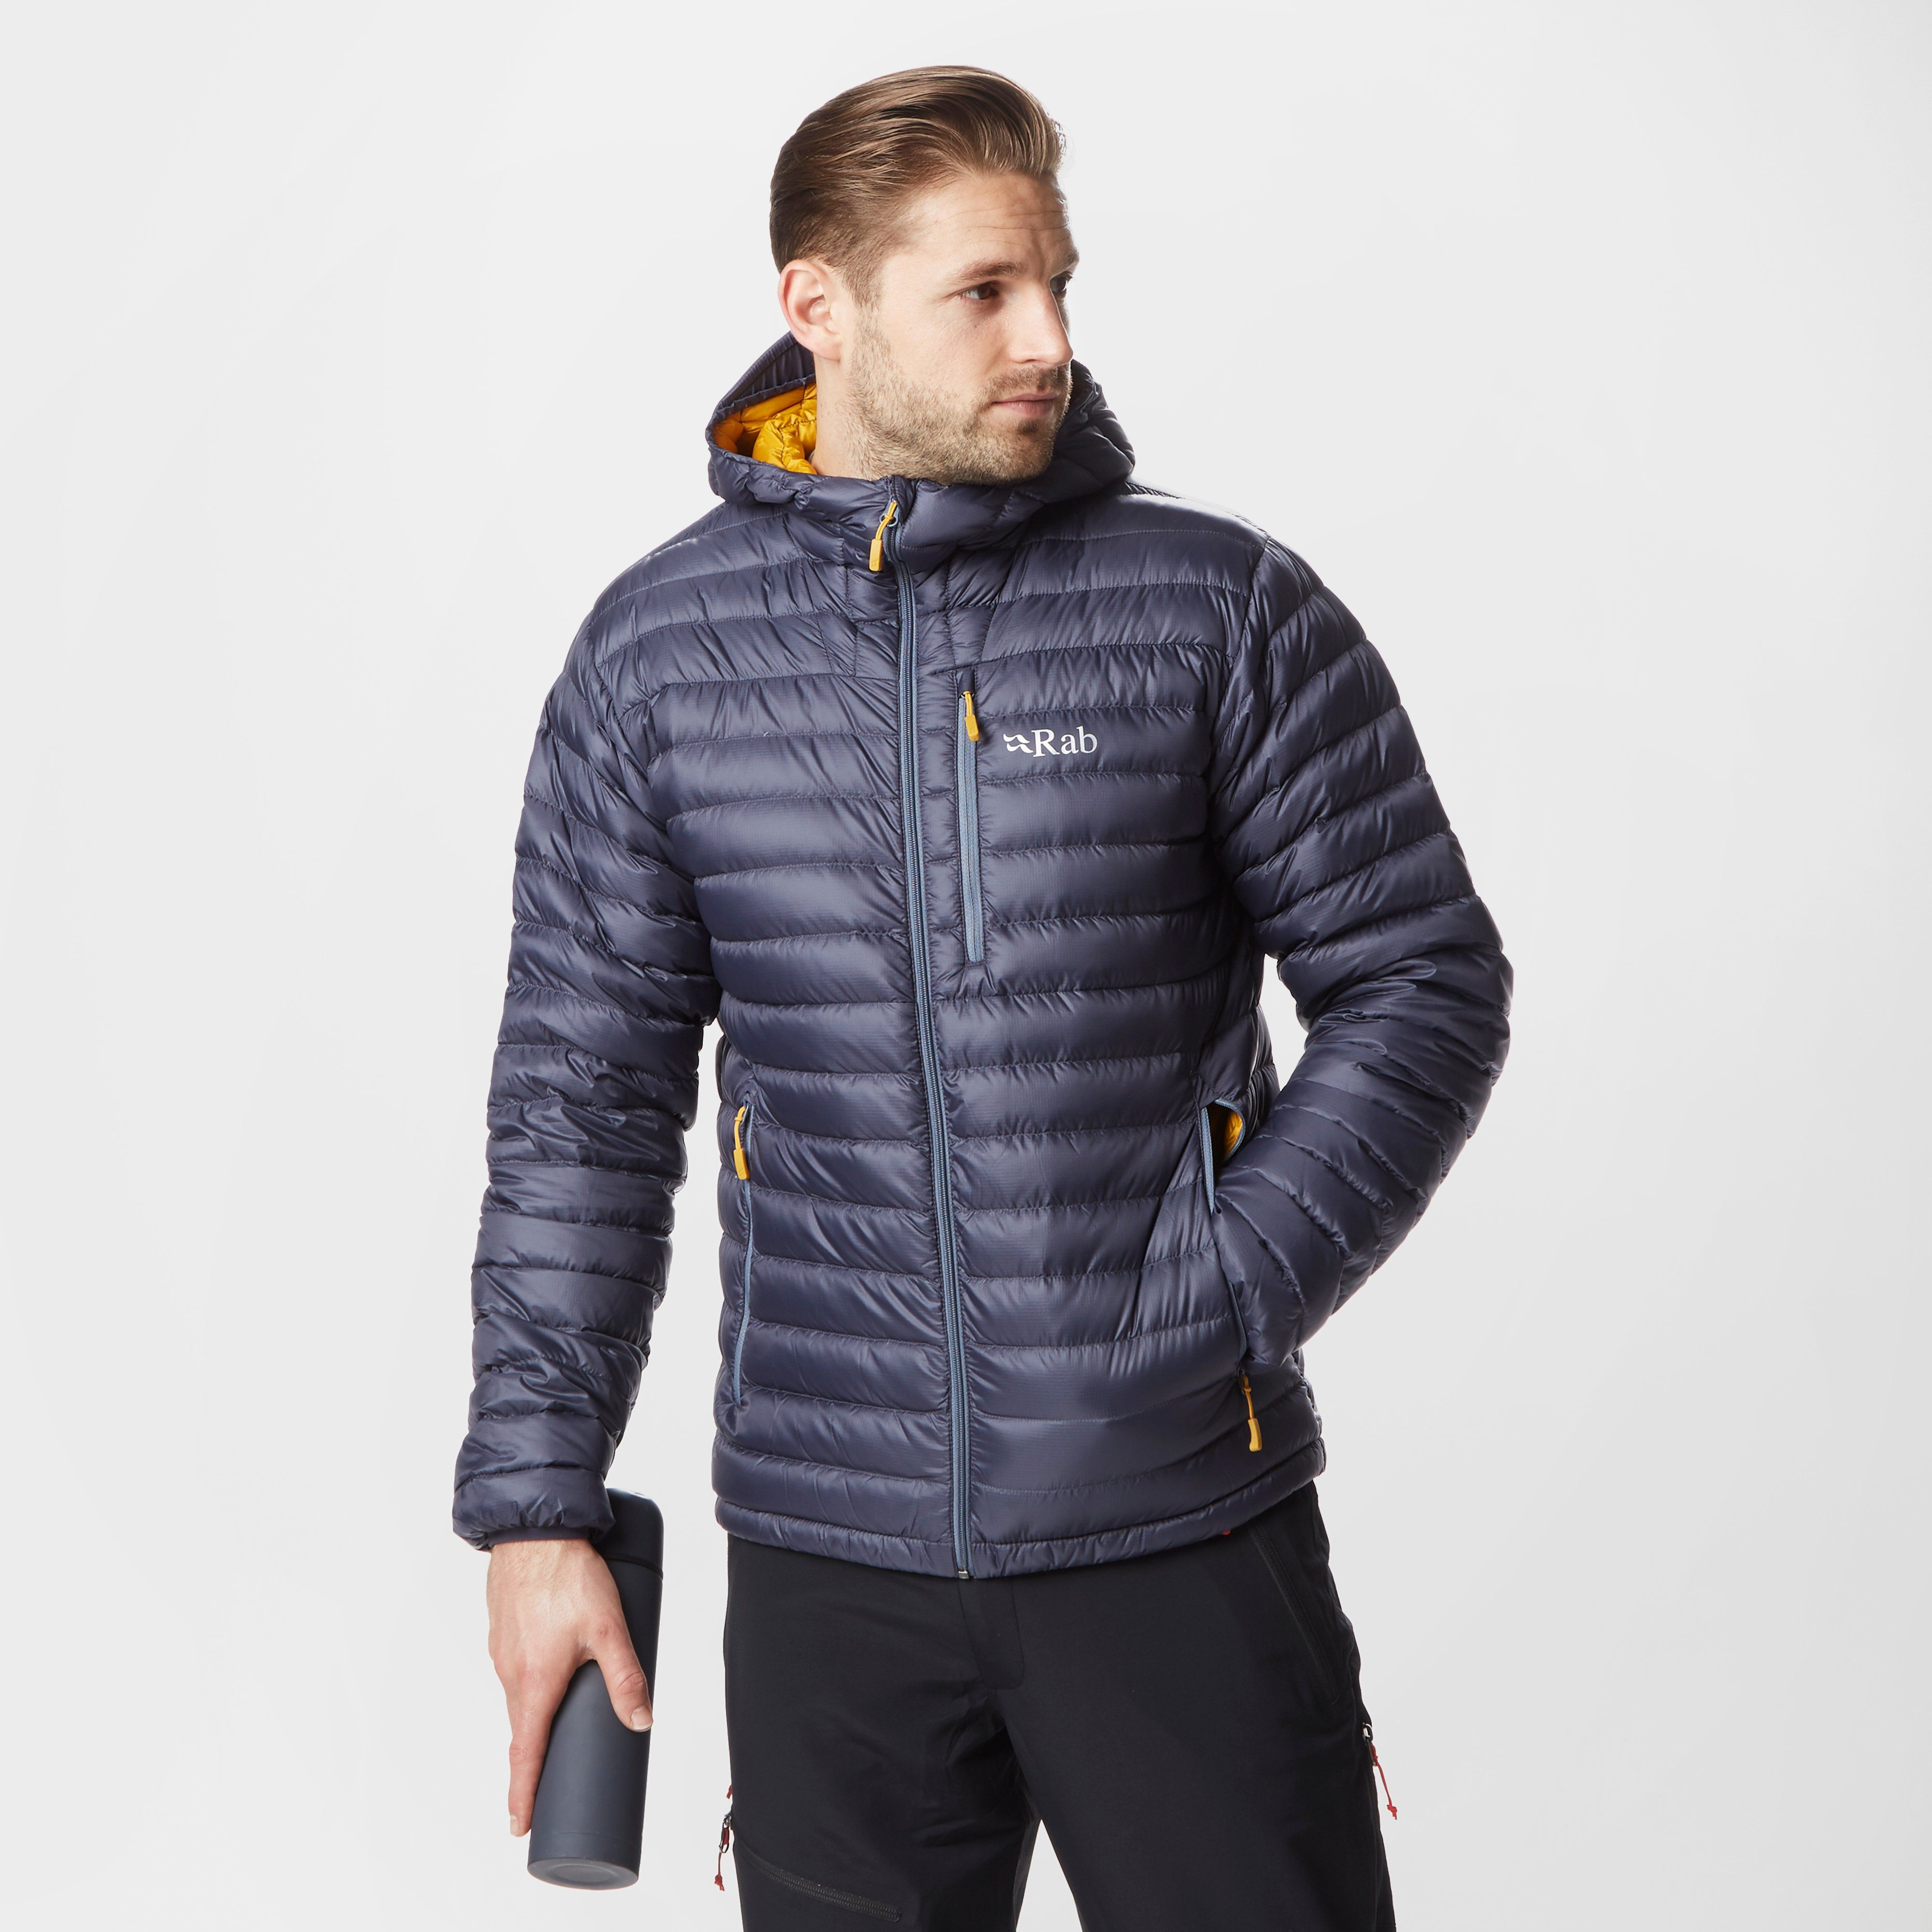 RAB Men's Microlight Alpine Jacket